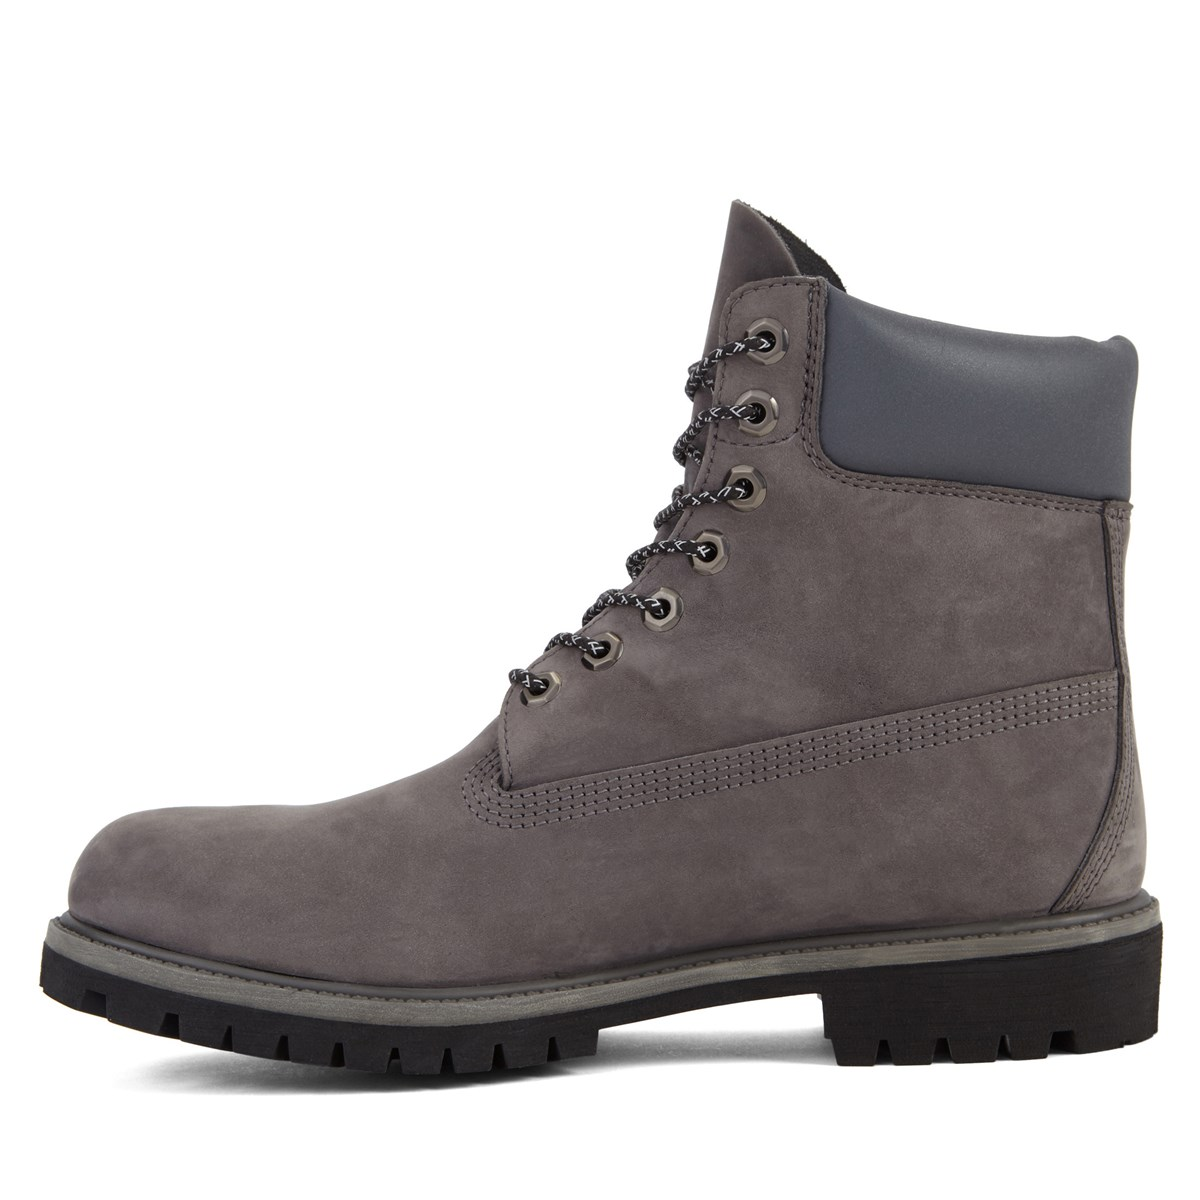 Timberland Menns 6 Tommers Premium Støvlene Smidd Jern fIEoAza